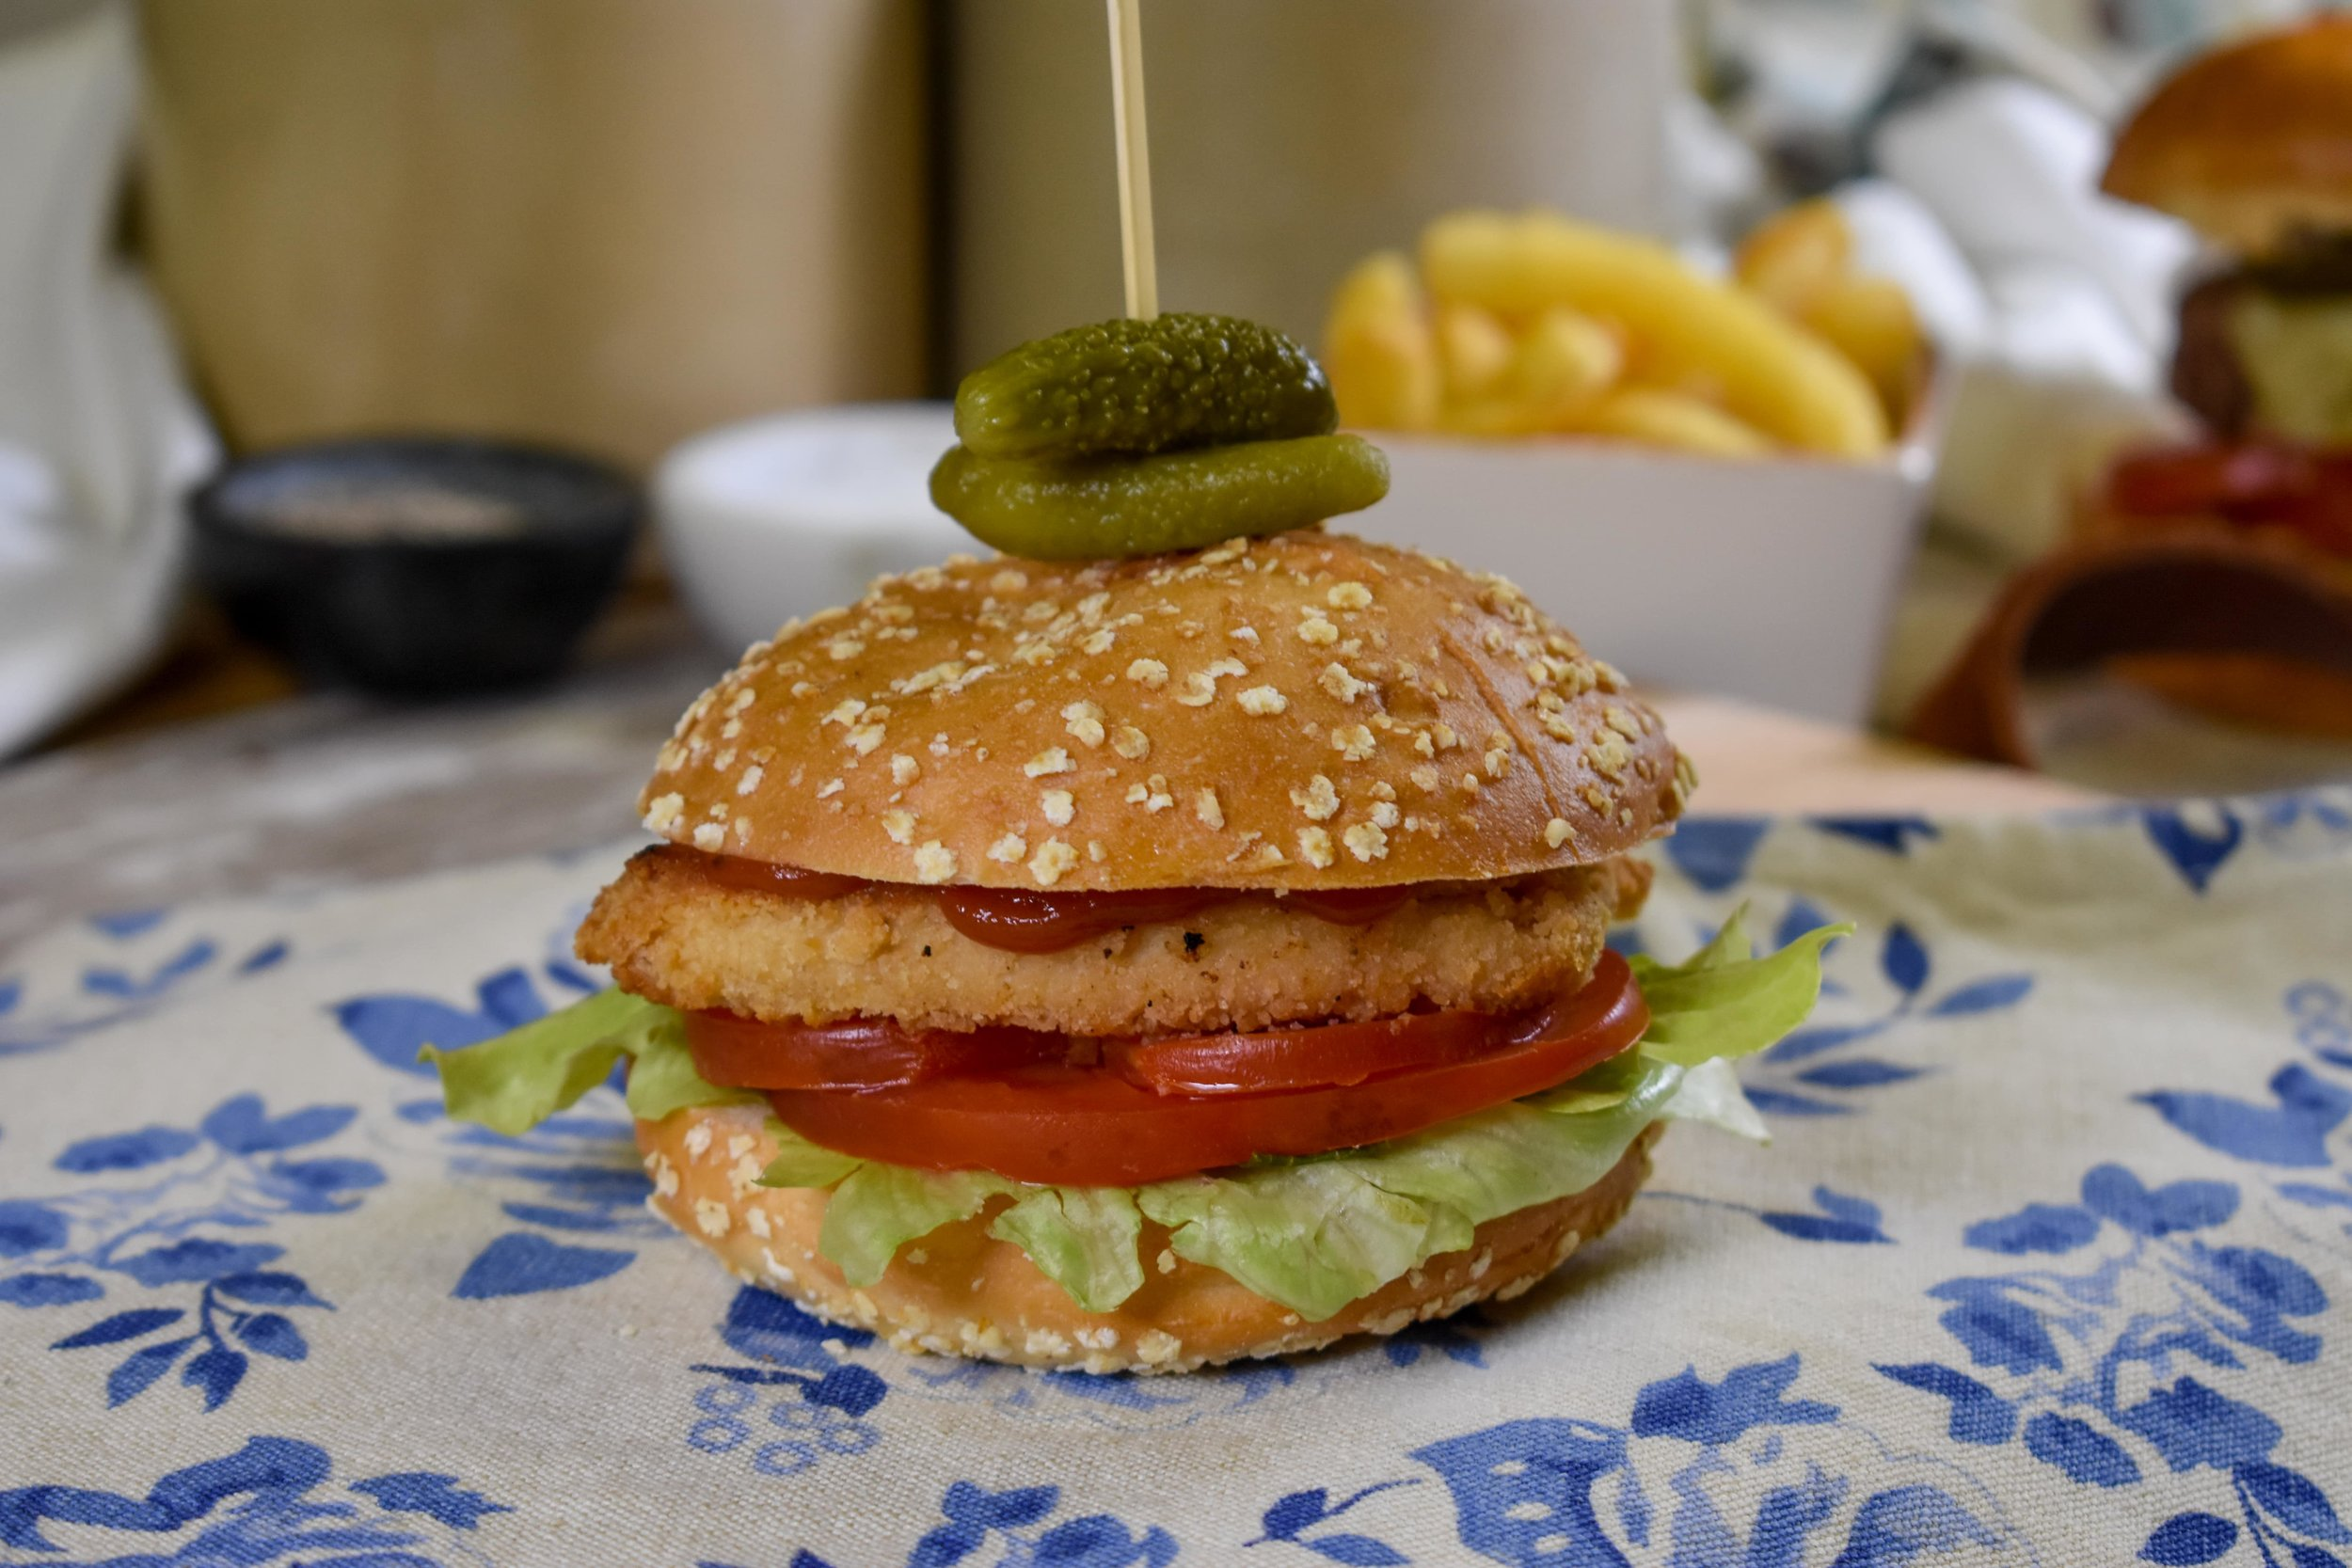 Gluten Free Burger Bun by Fosters Bakery